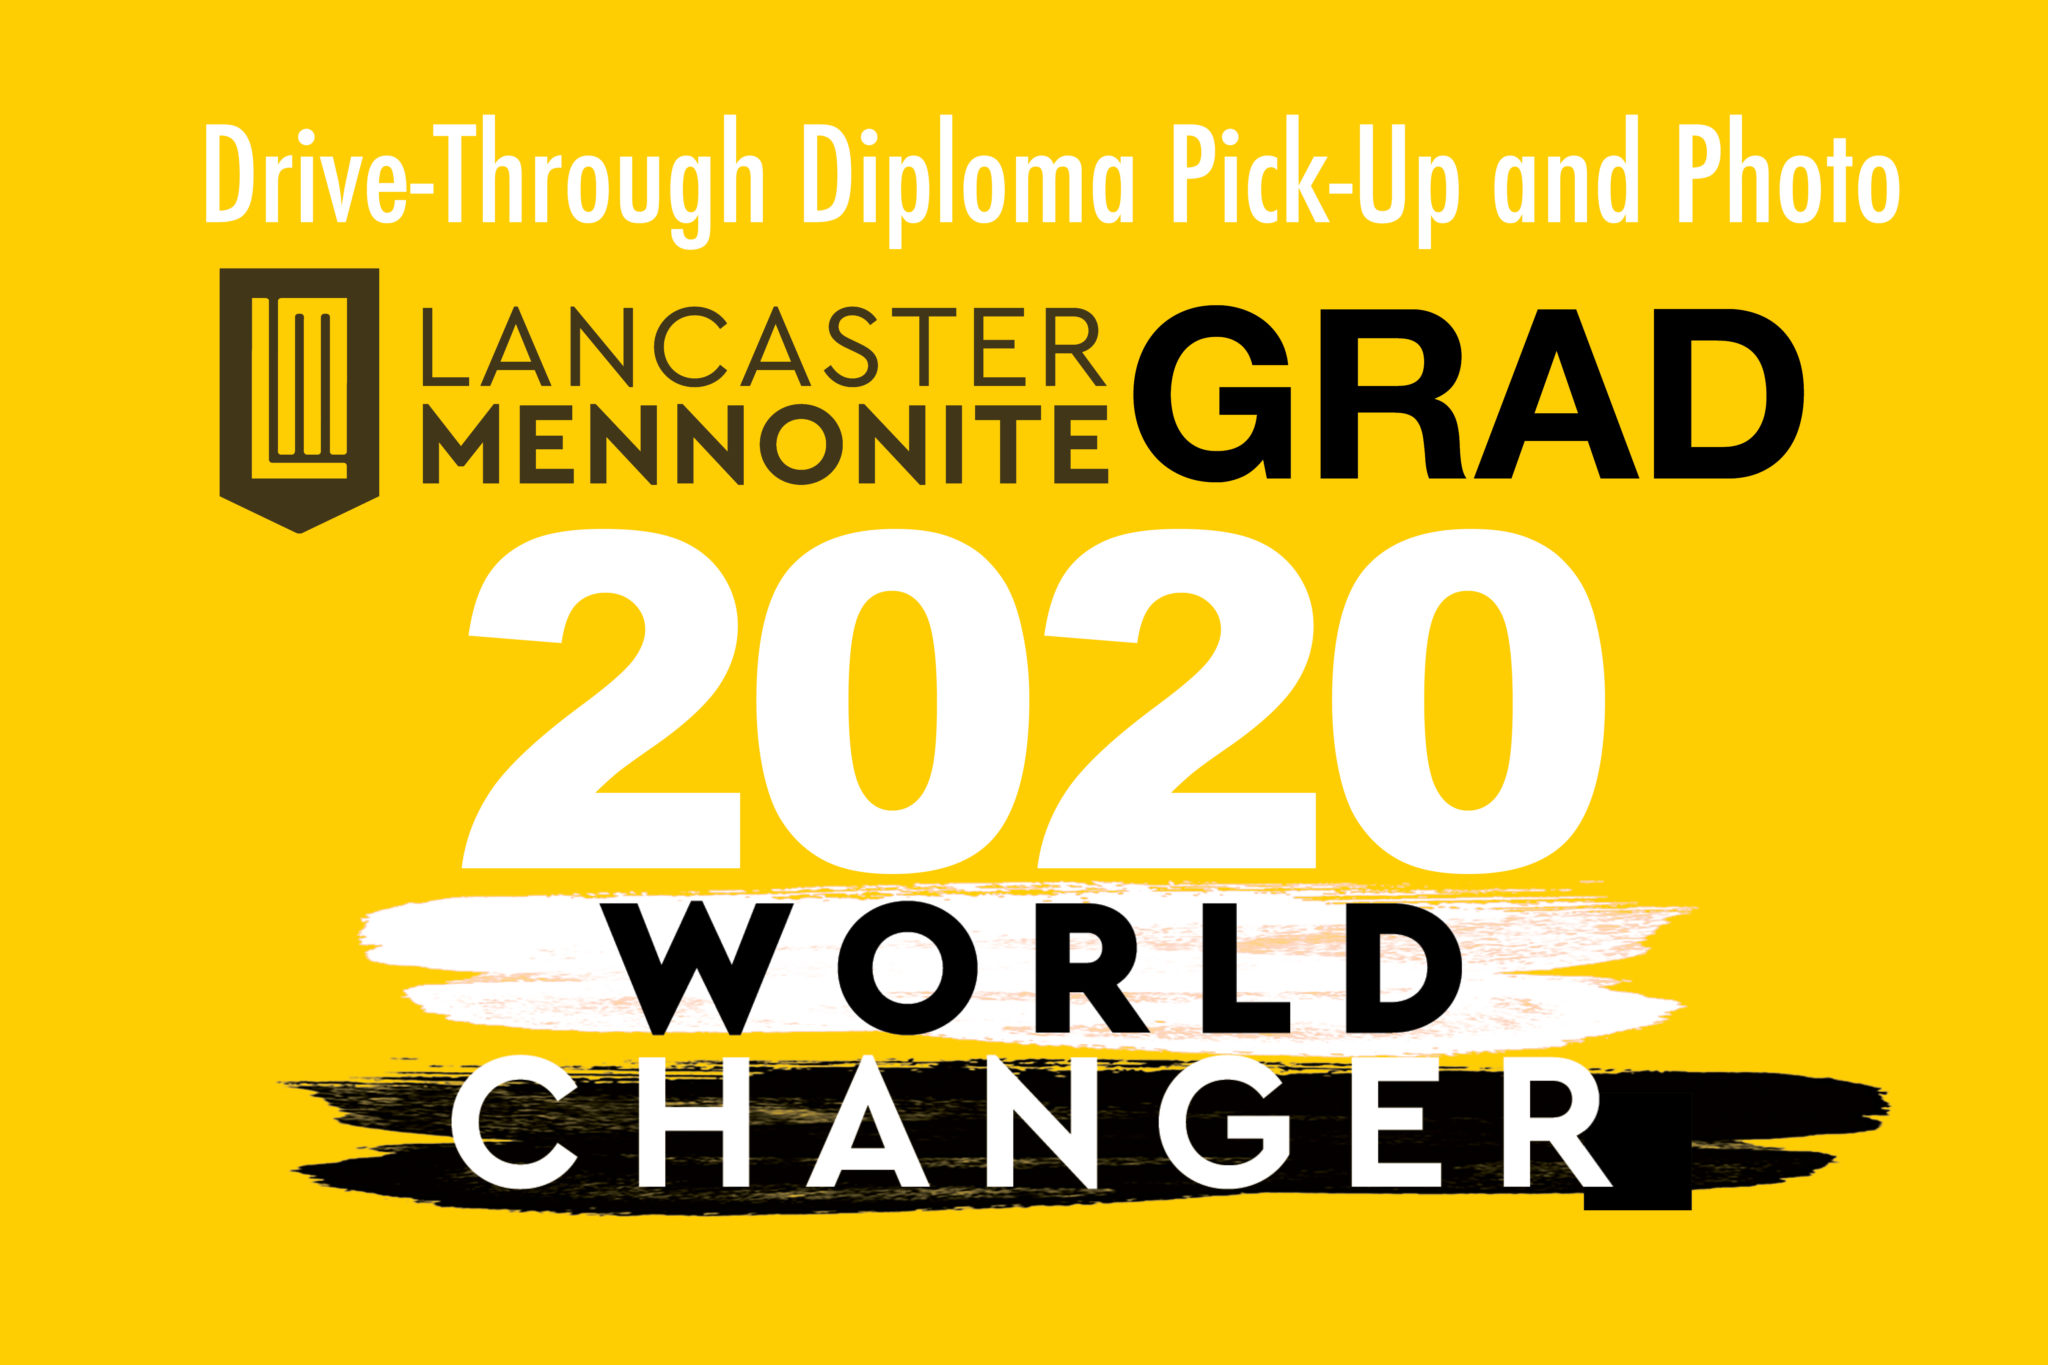 drive through graduation image